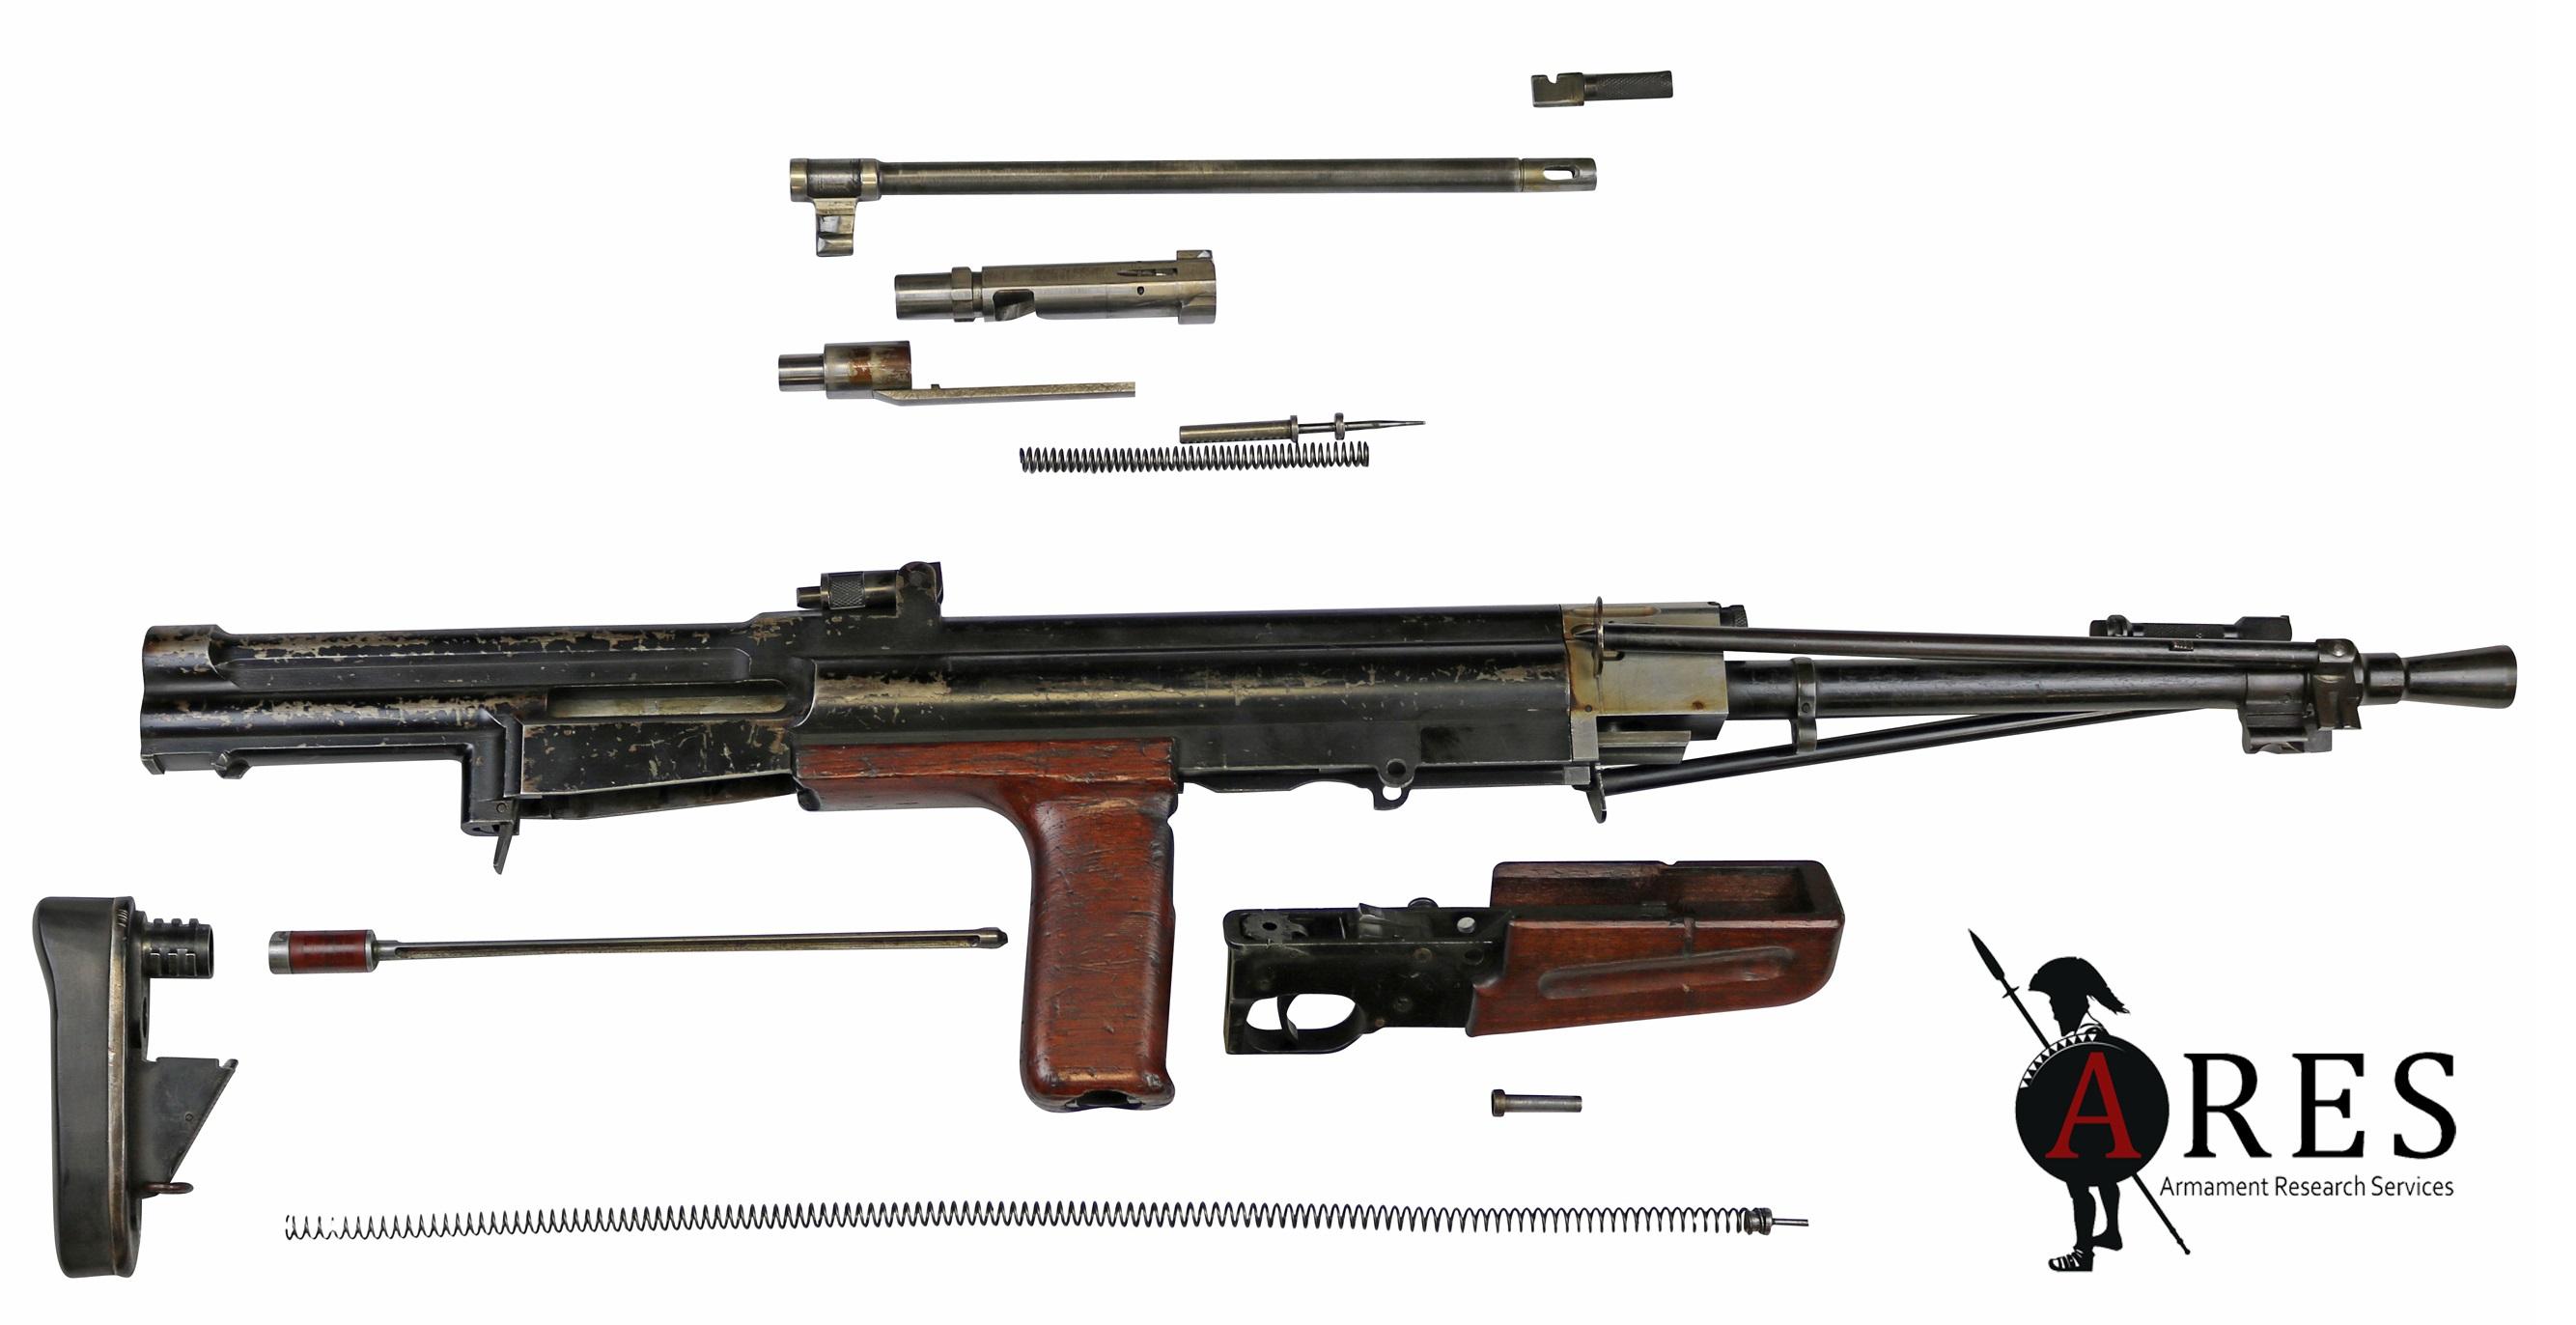 British Korsak E M 1 light machine gun – Armament Research Services